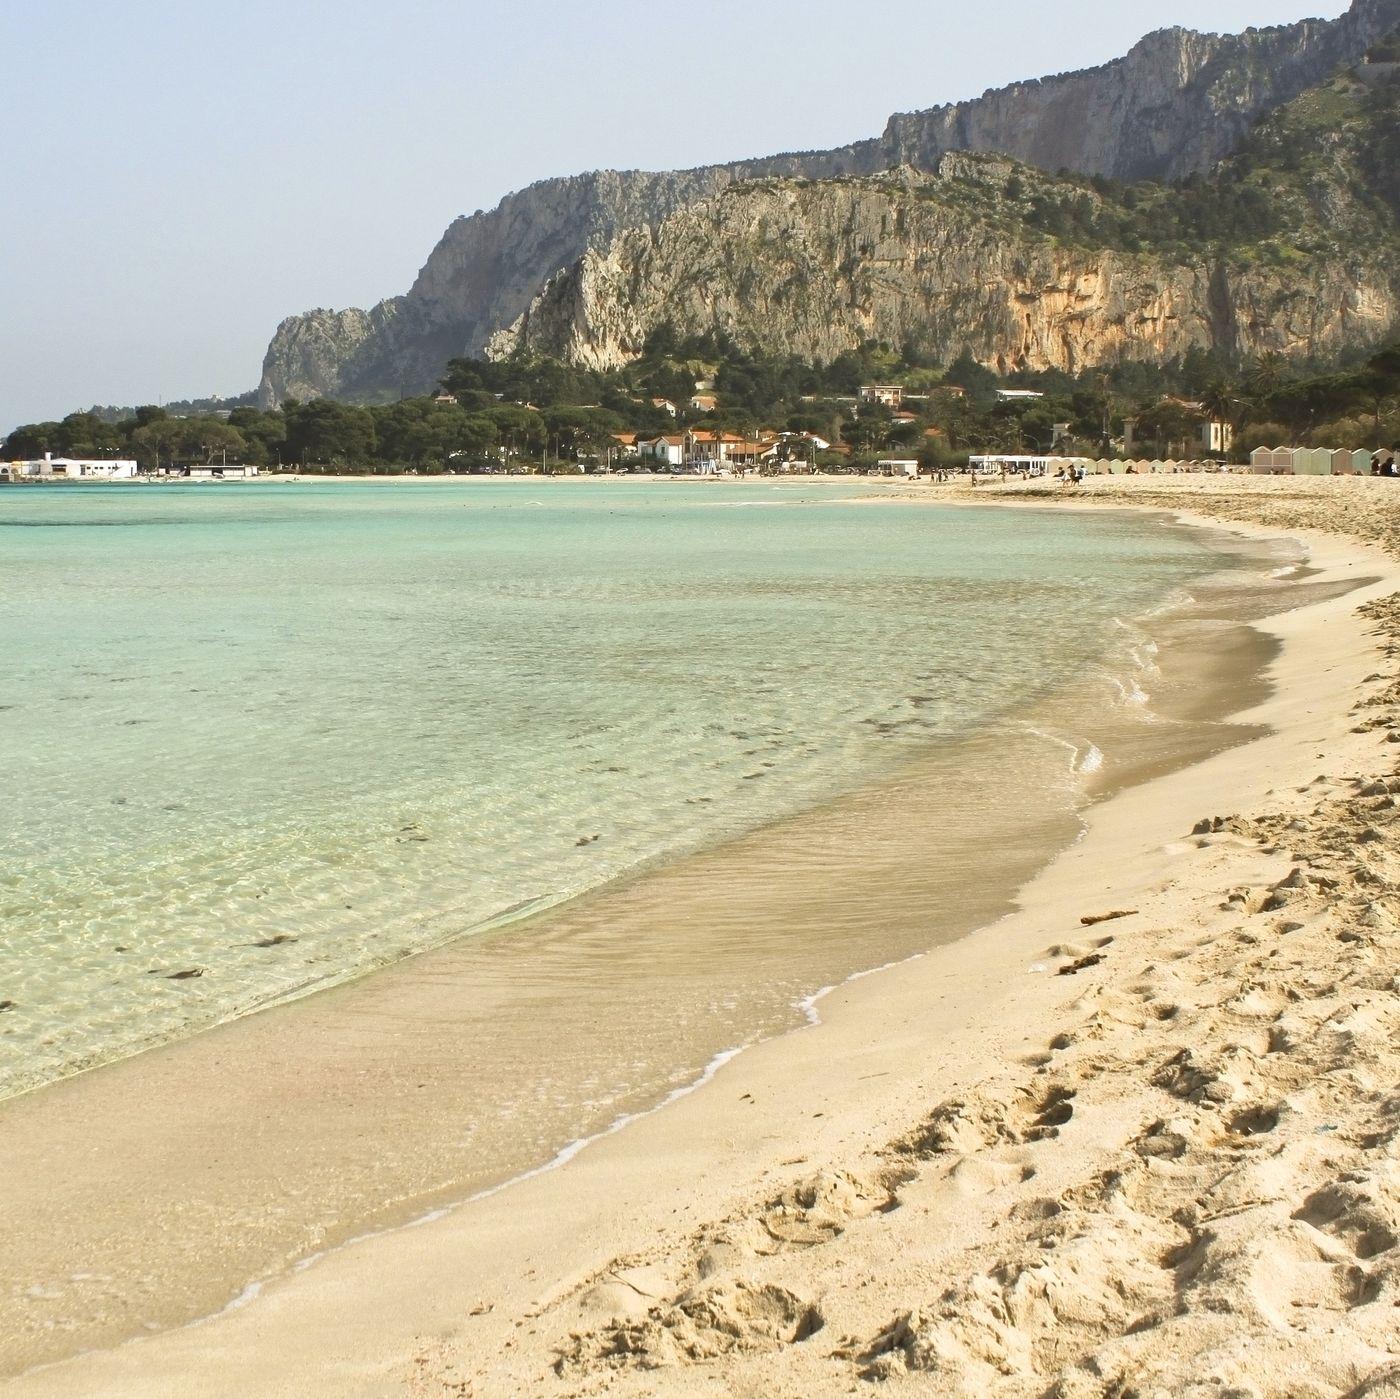 Beach holidays in Italy: Sicily, Mondello beach